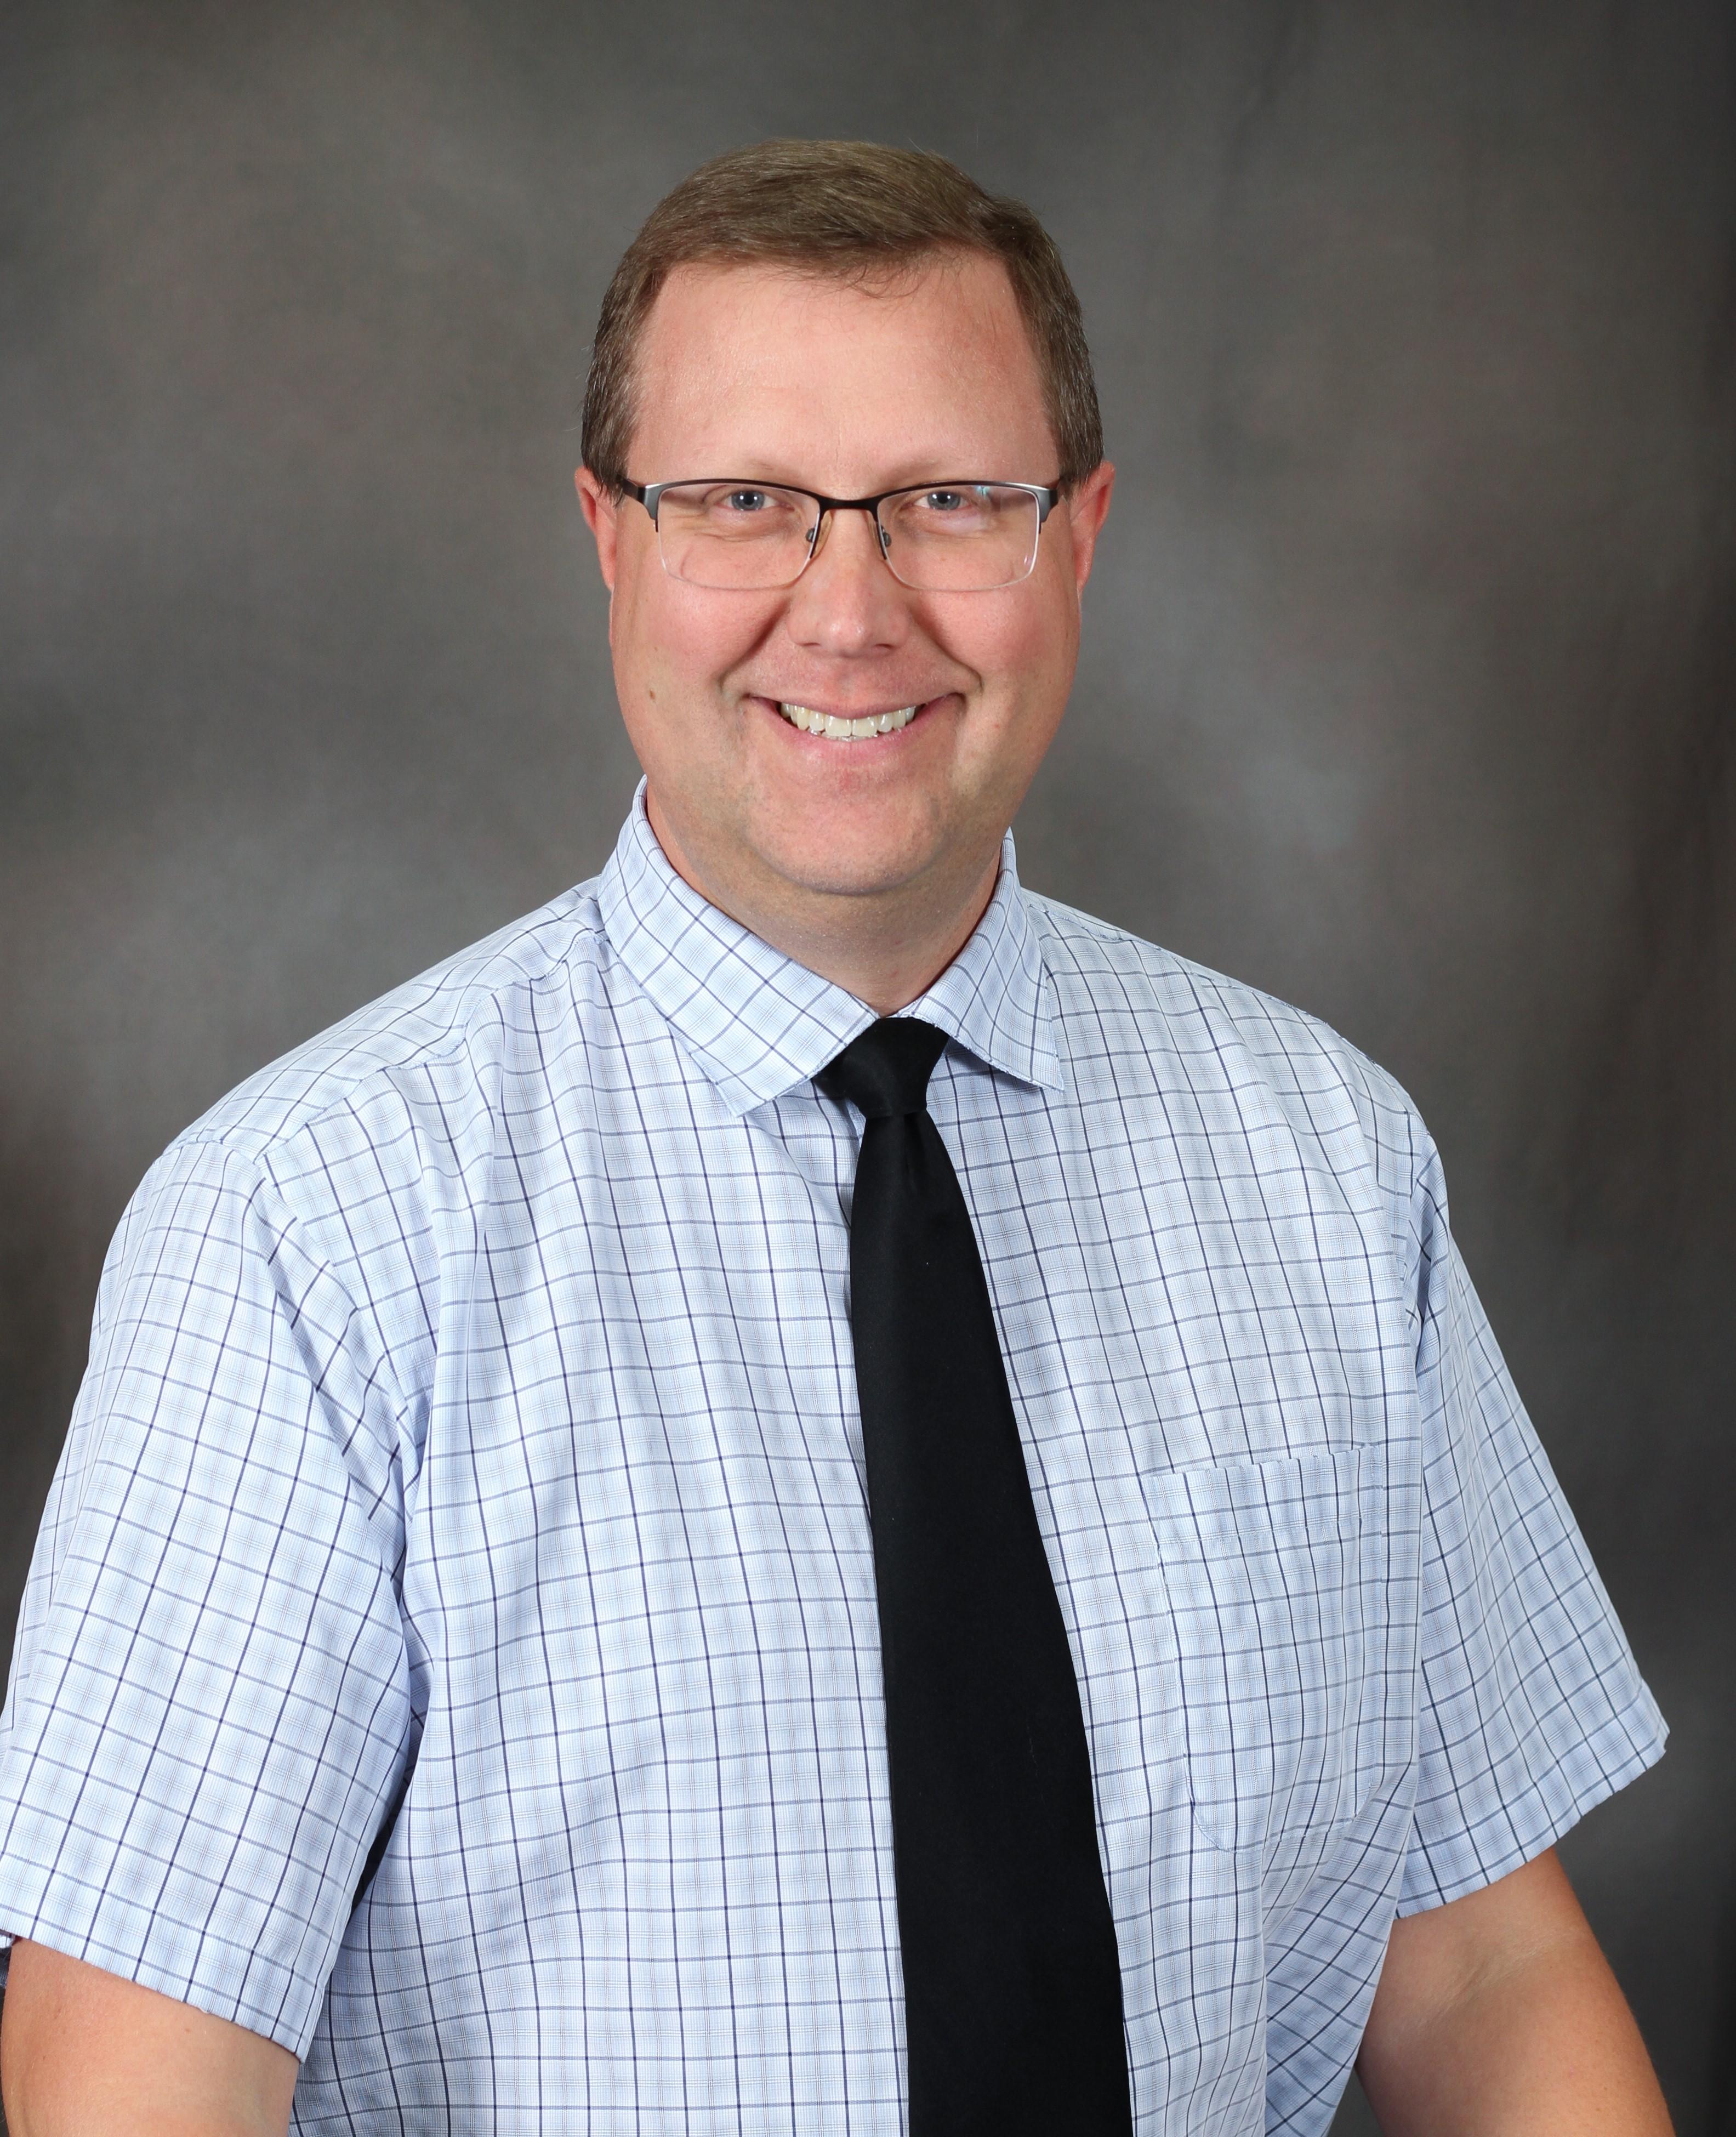 Mike Feenstra